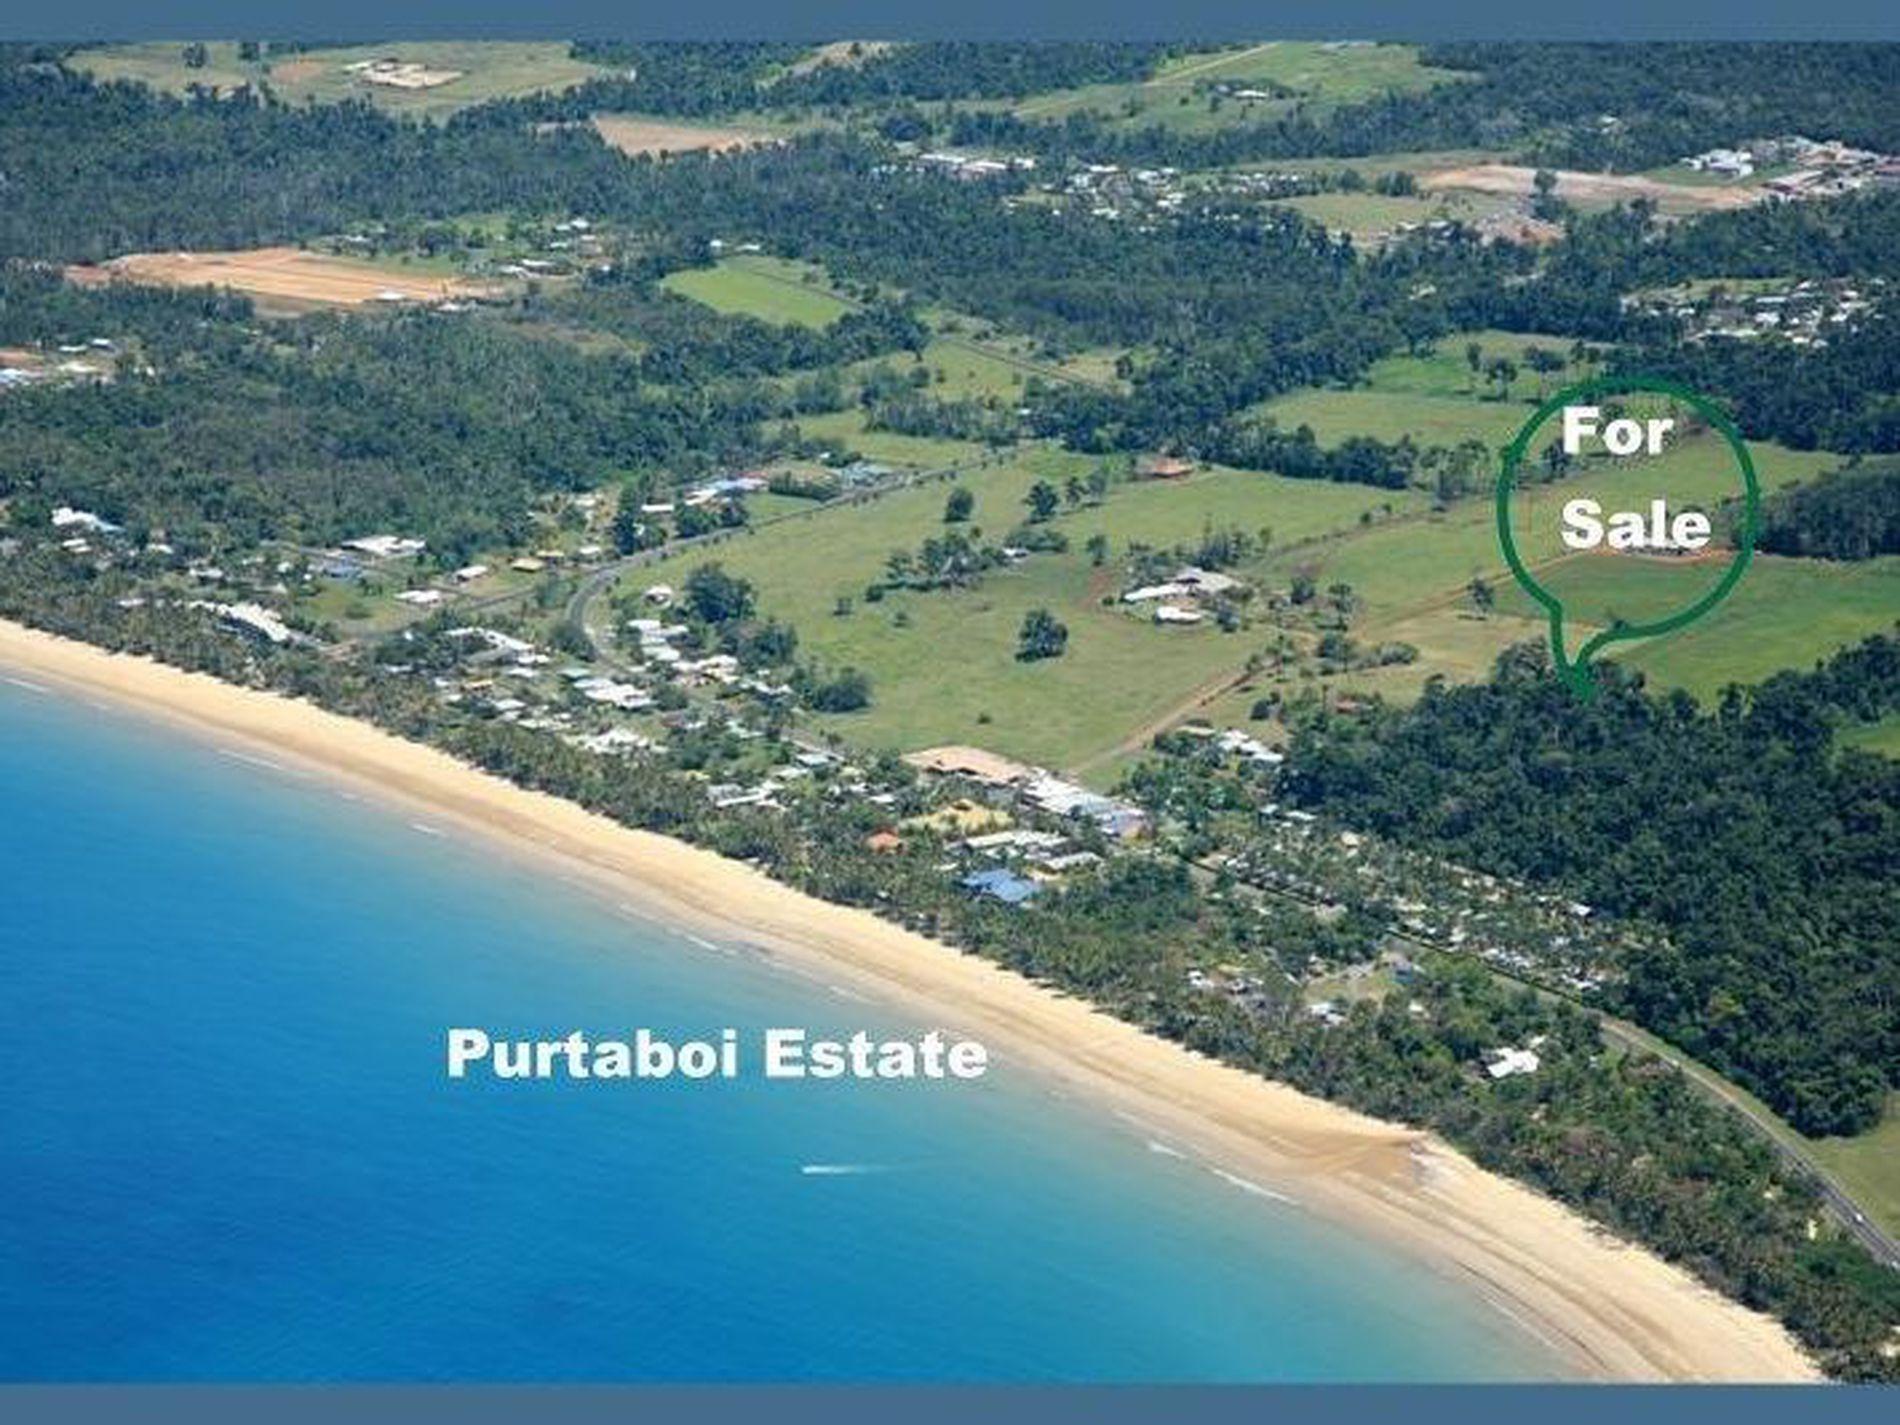 Lot 69, 69 Purtaboi Close, Mission Beach